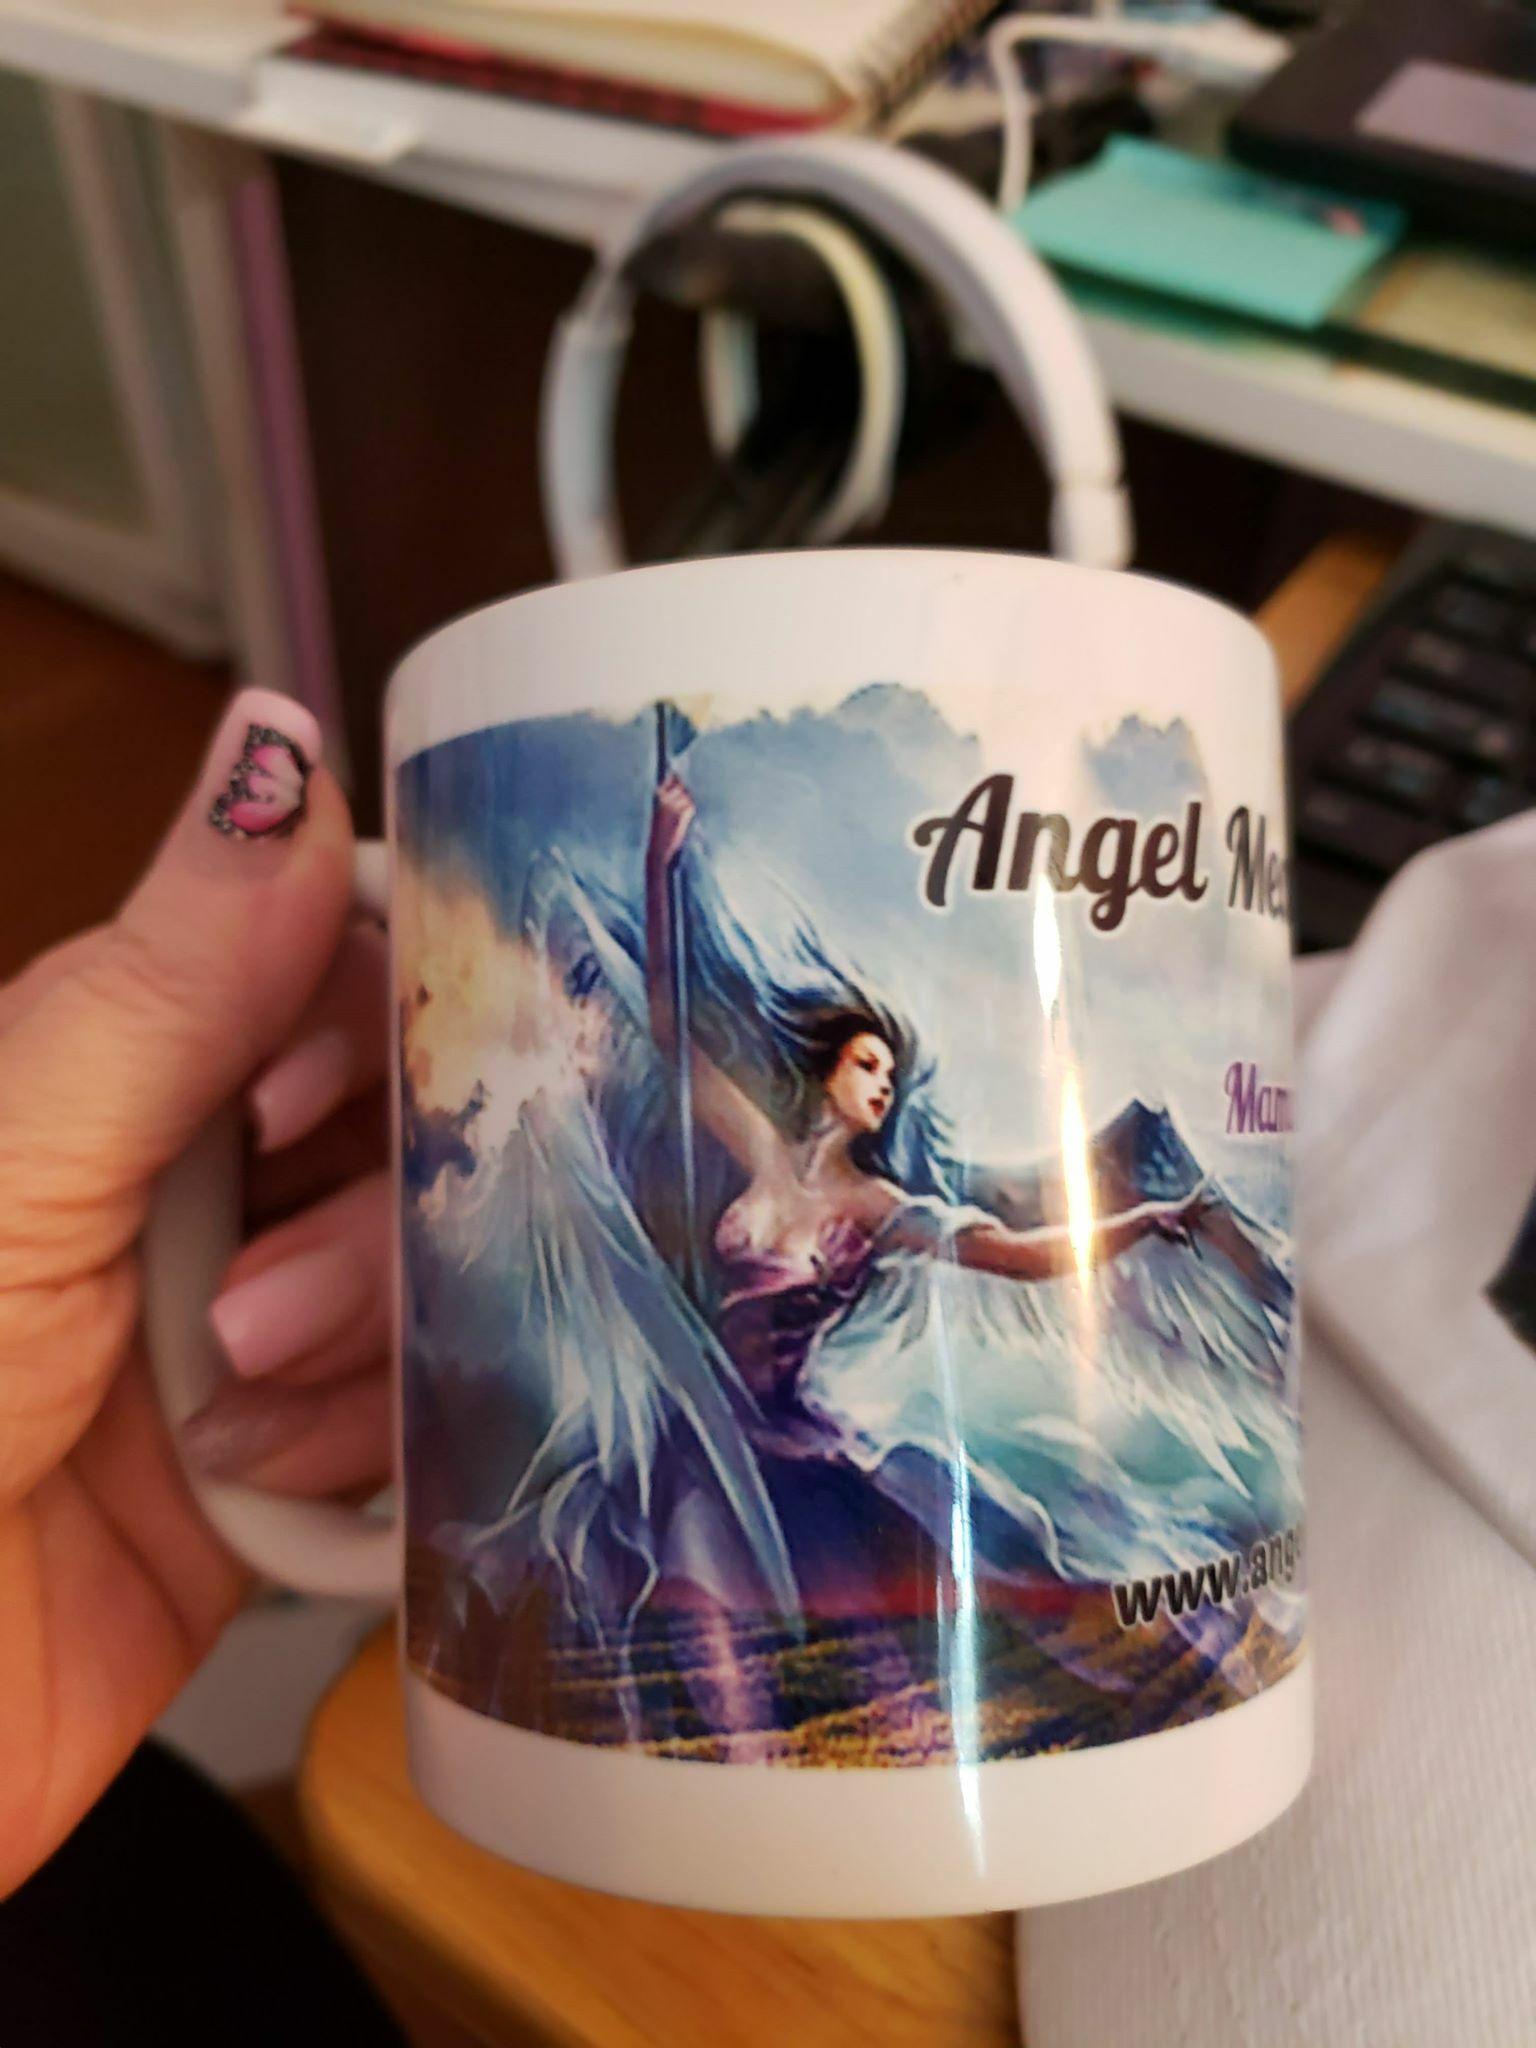 Angel Meadows Radio Mug